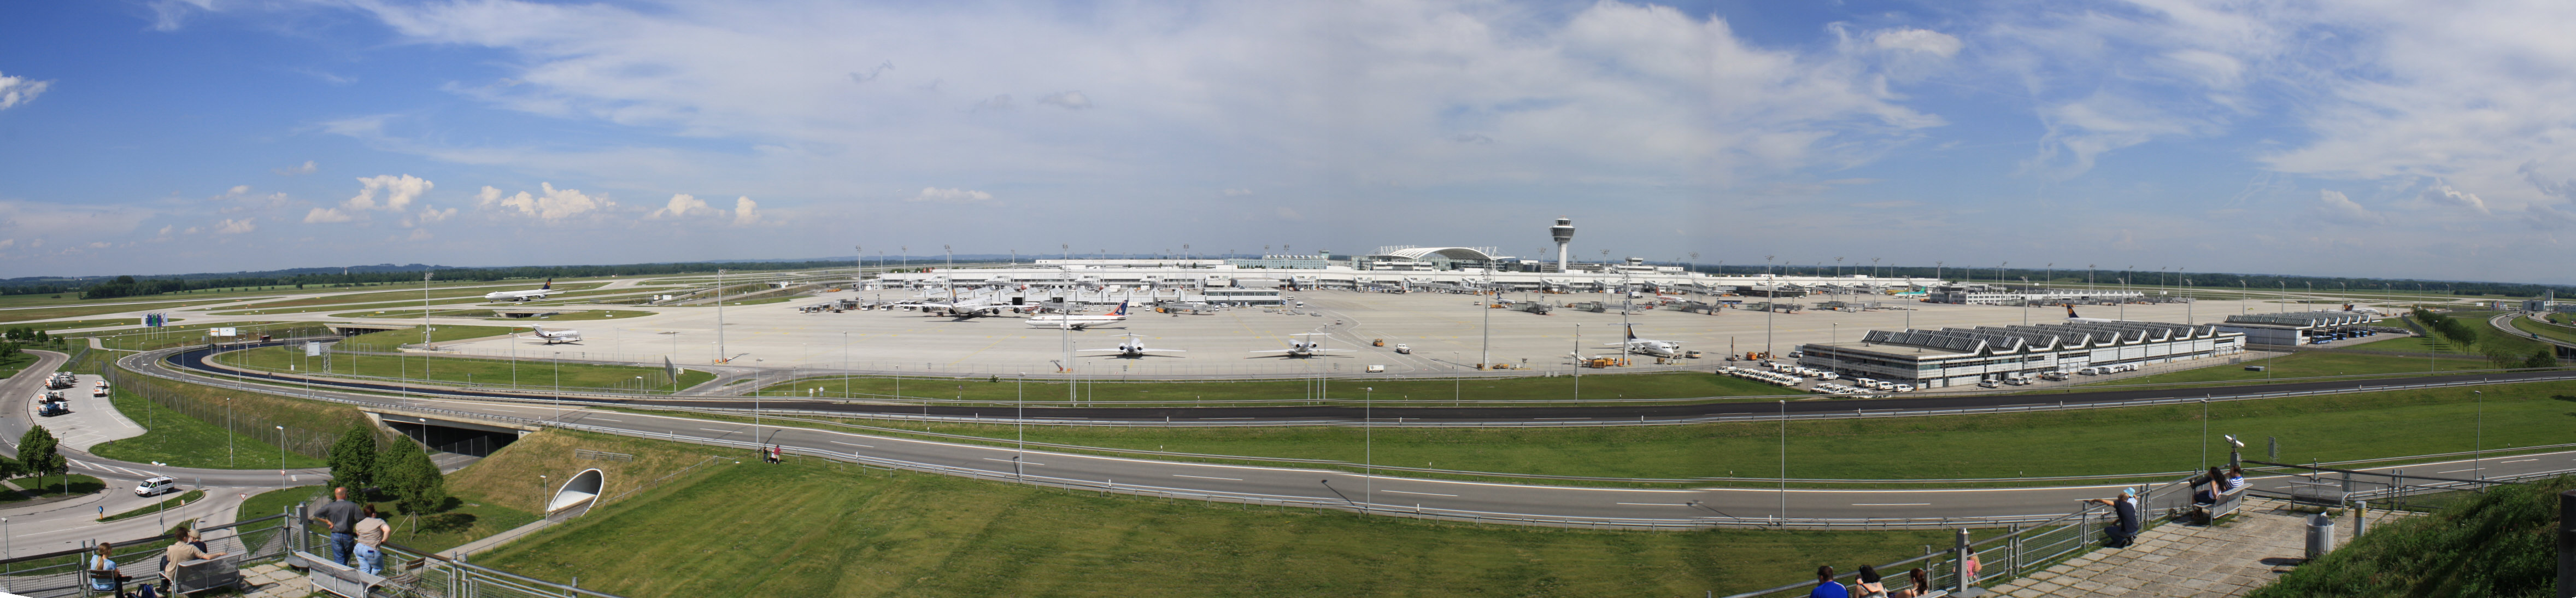 The Airport Franz-Josef-Strauss, Munich